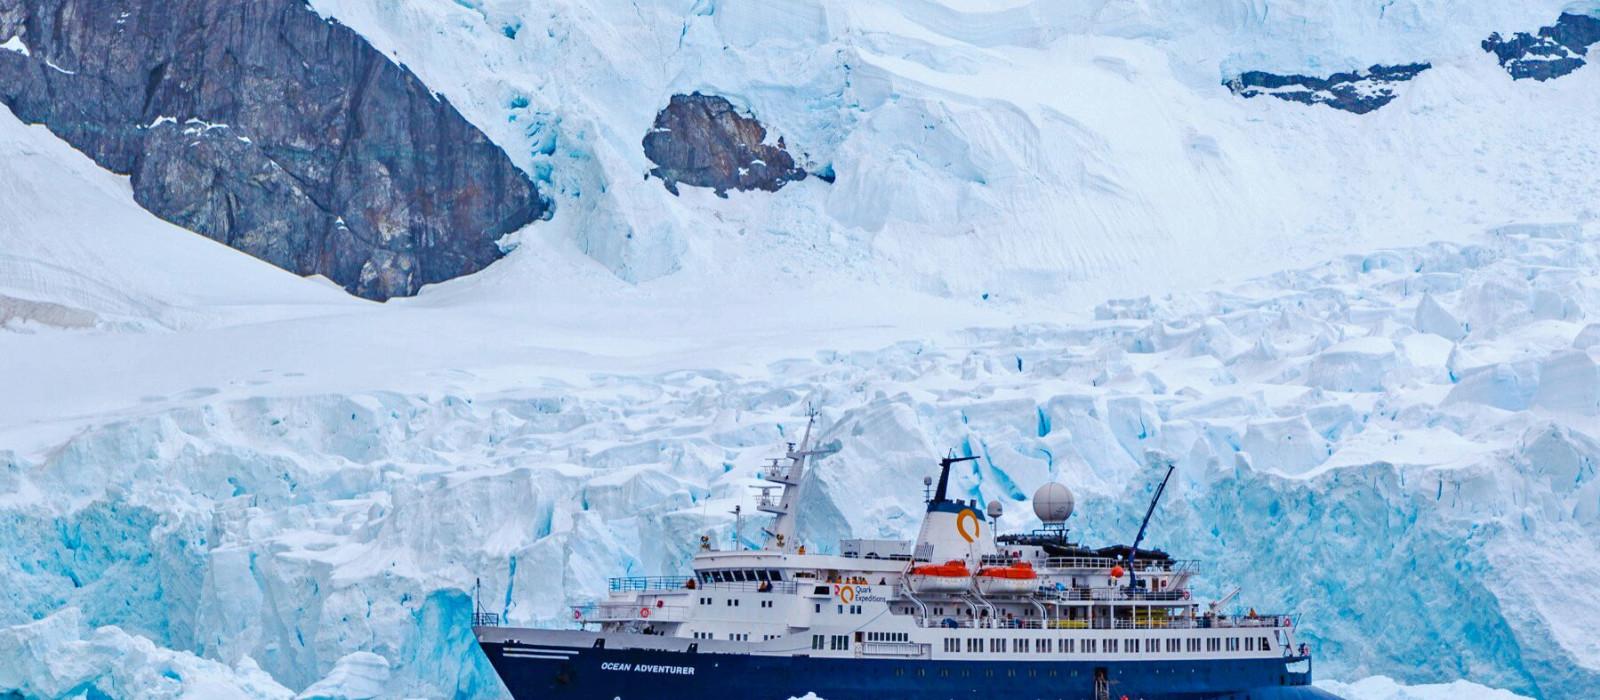 Hotel Ocean Adventurer (Quark Expeditions) Antarktis